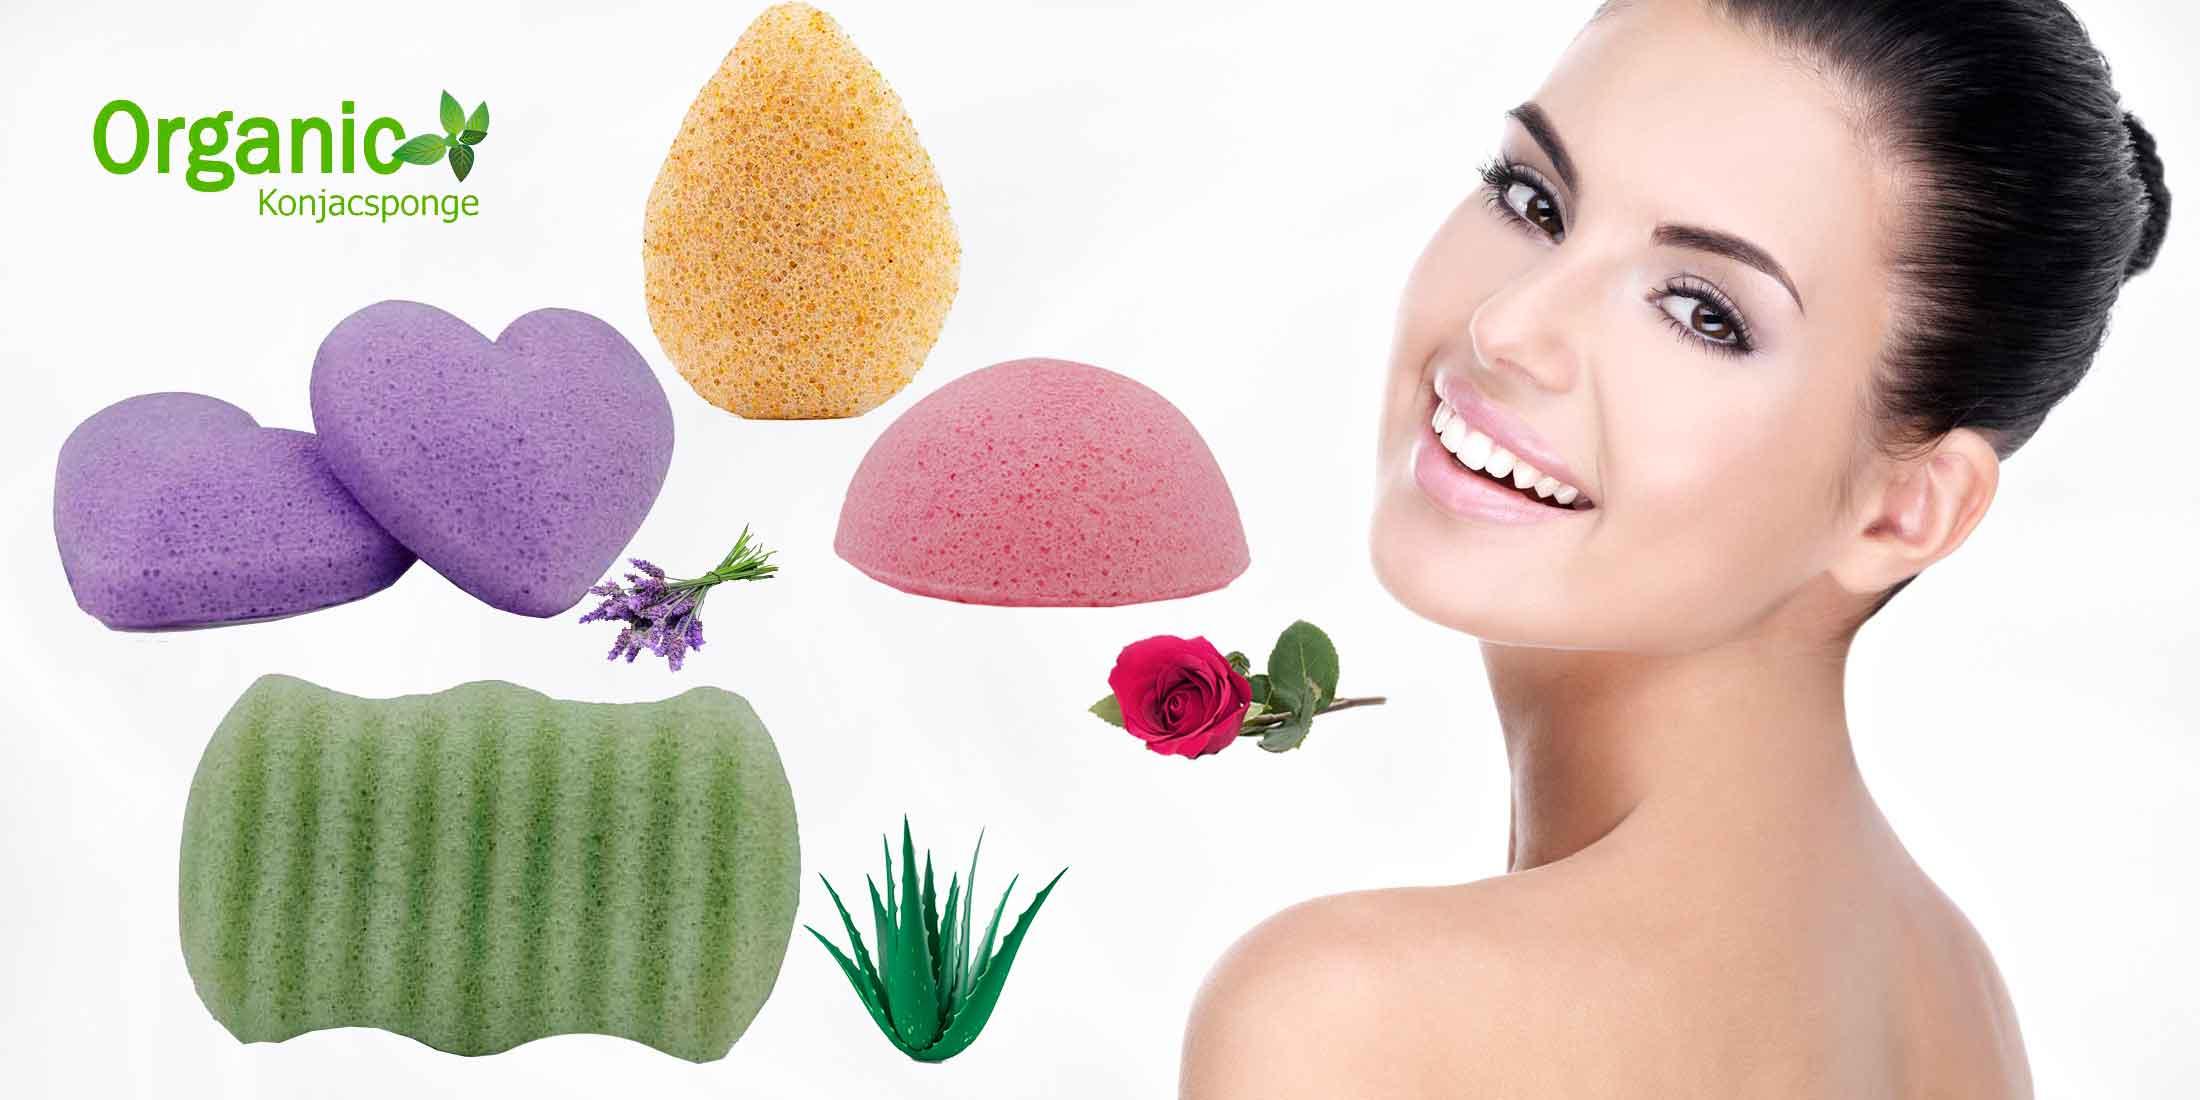 Organic Konjac Sponge tvättsvampar